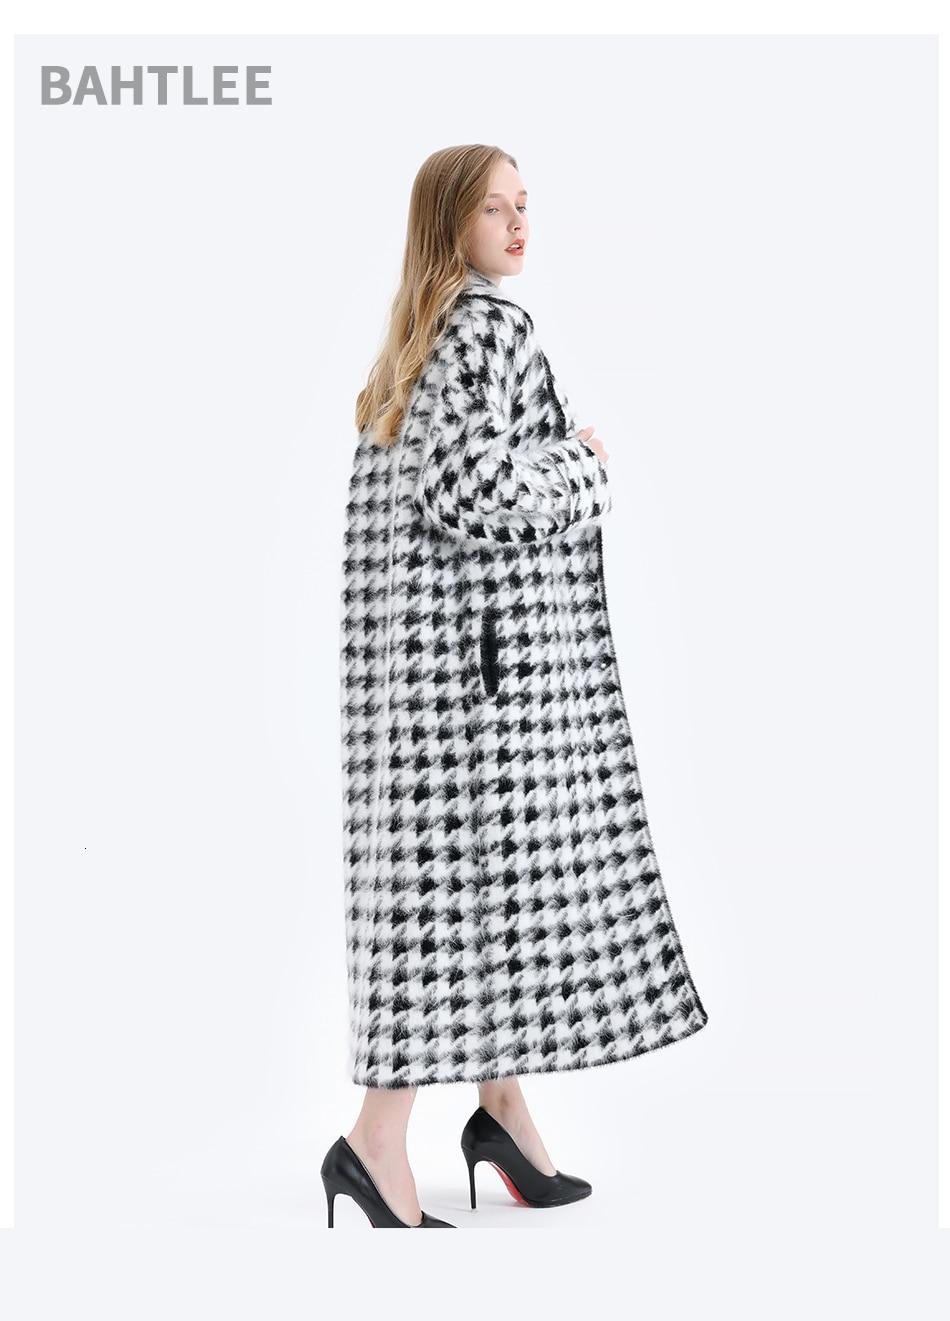 BAHTLEE Women Angora Long Coat Houndstooth Pattern Sweater Winter Wool Knitted Cardigans Jumper Turn Down Collar Long Sleeves 9